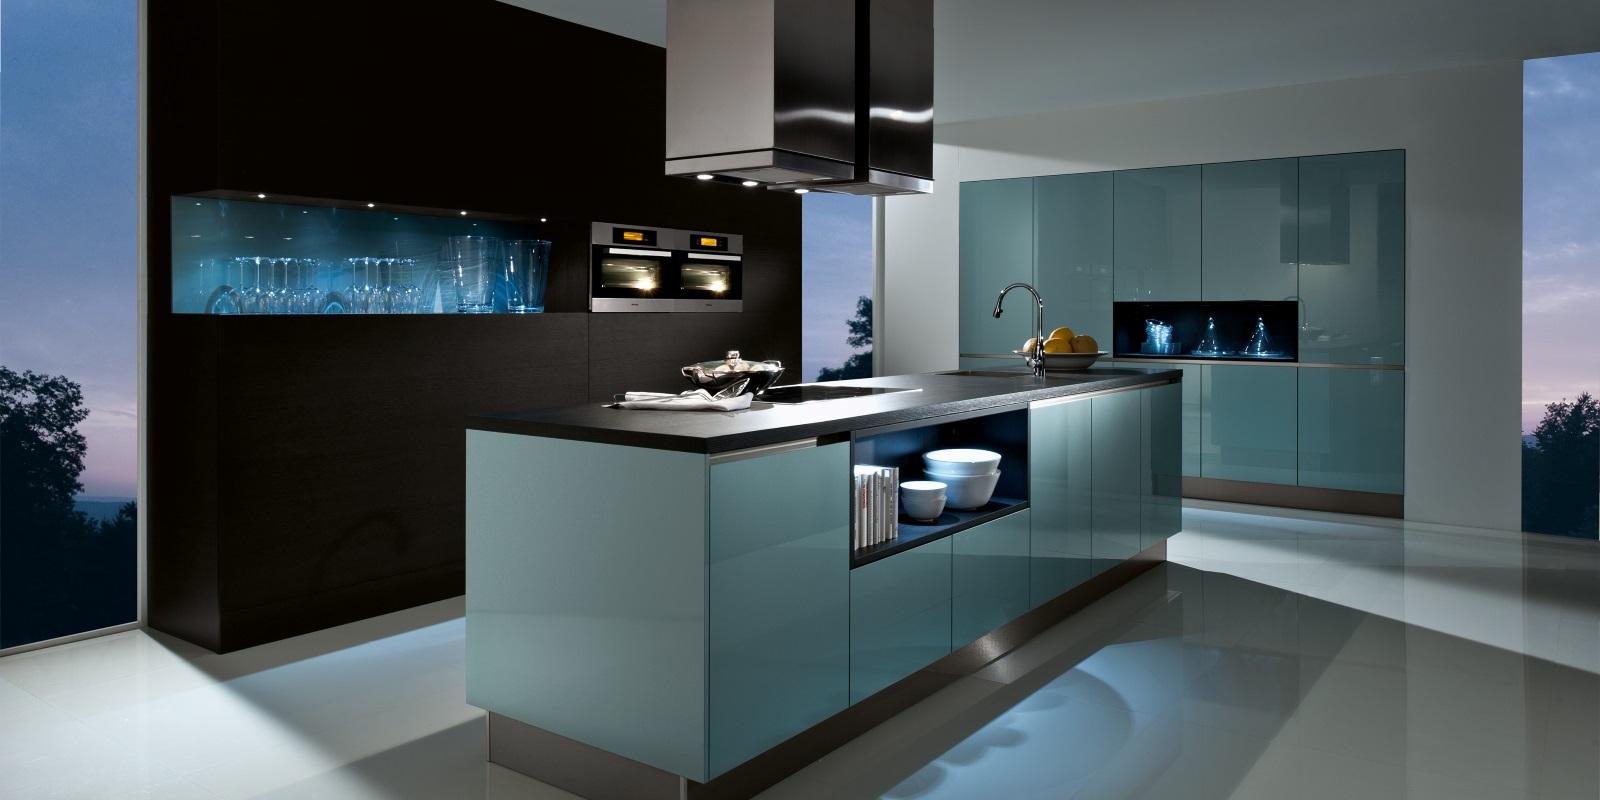 Kitchen Specialists in Perth - Perth Kitchen Centre